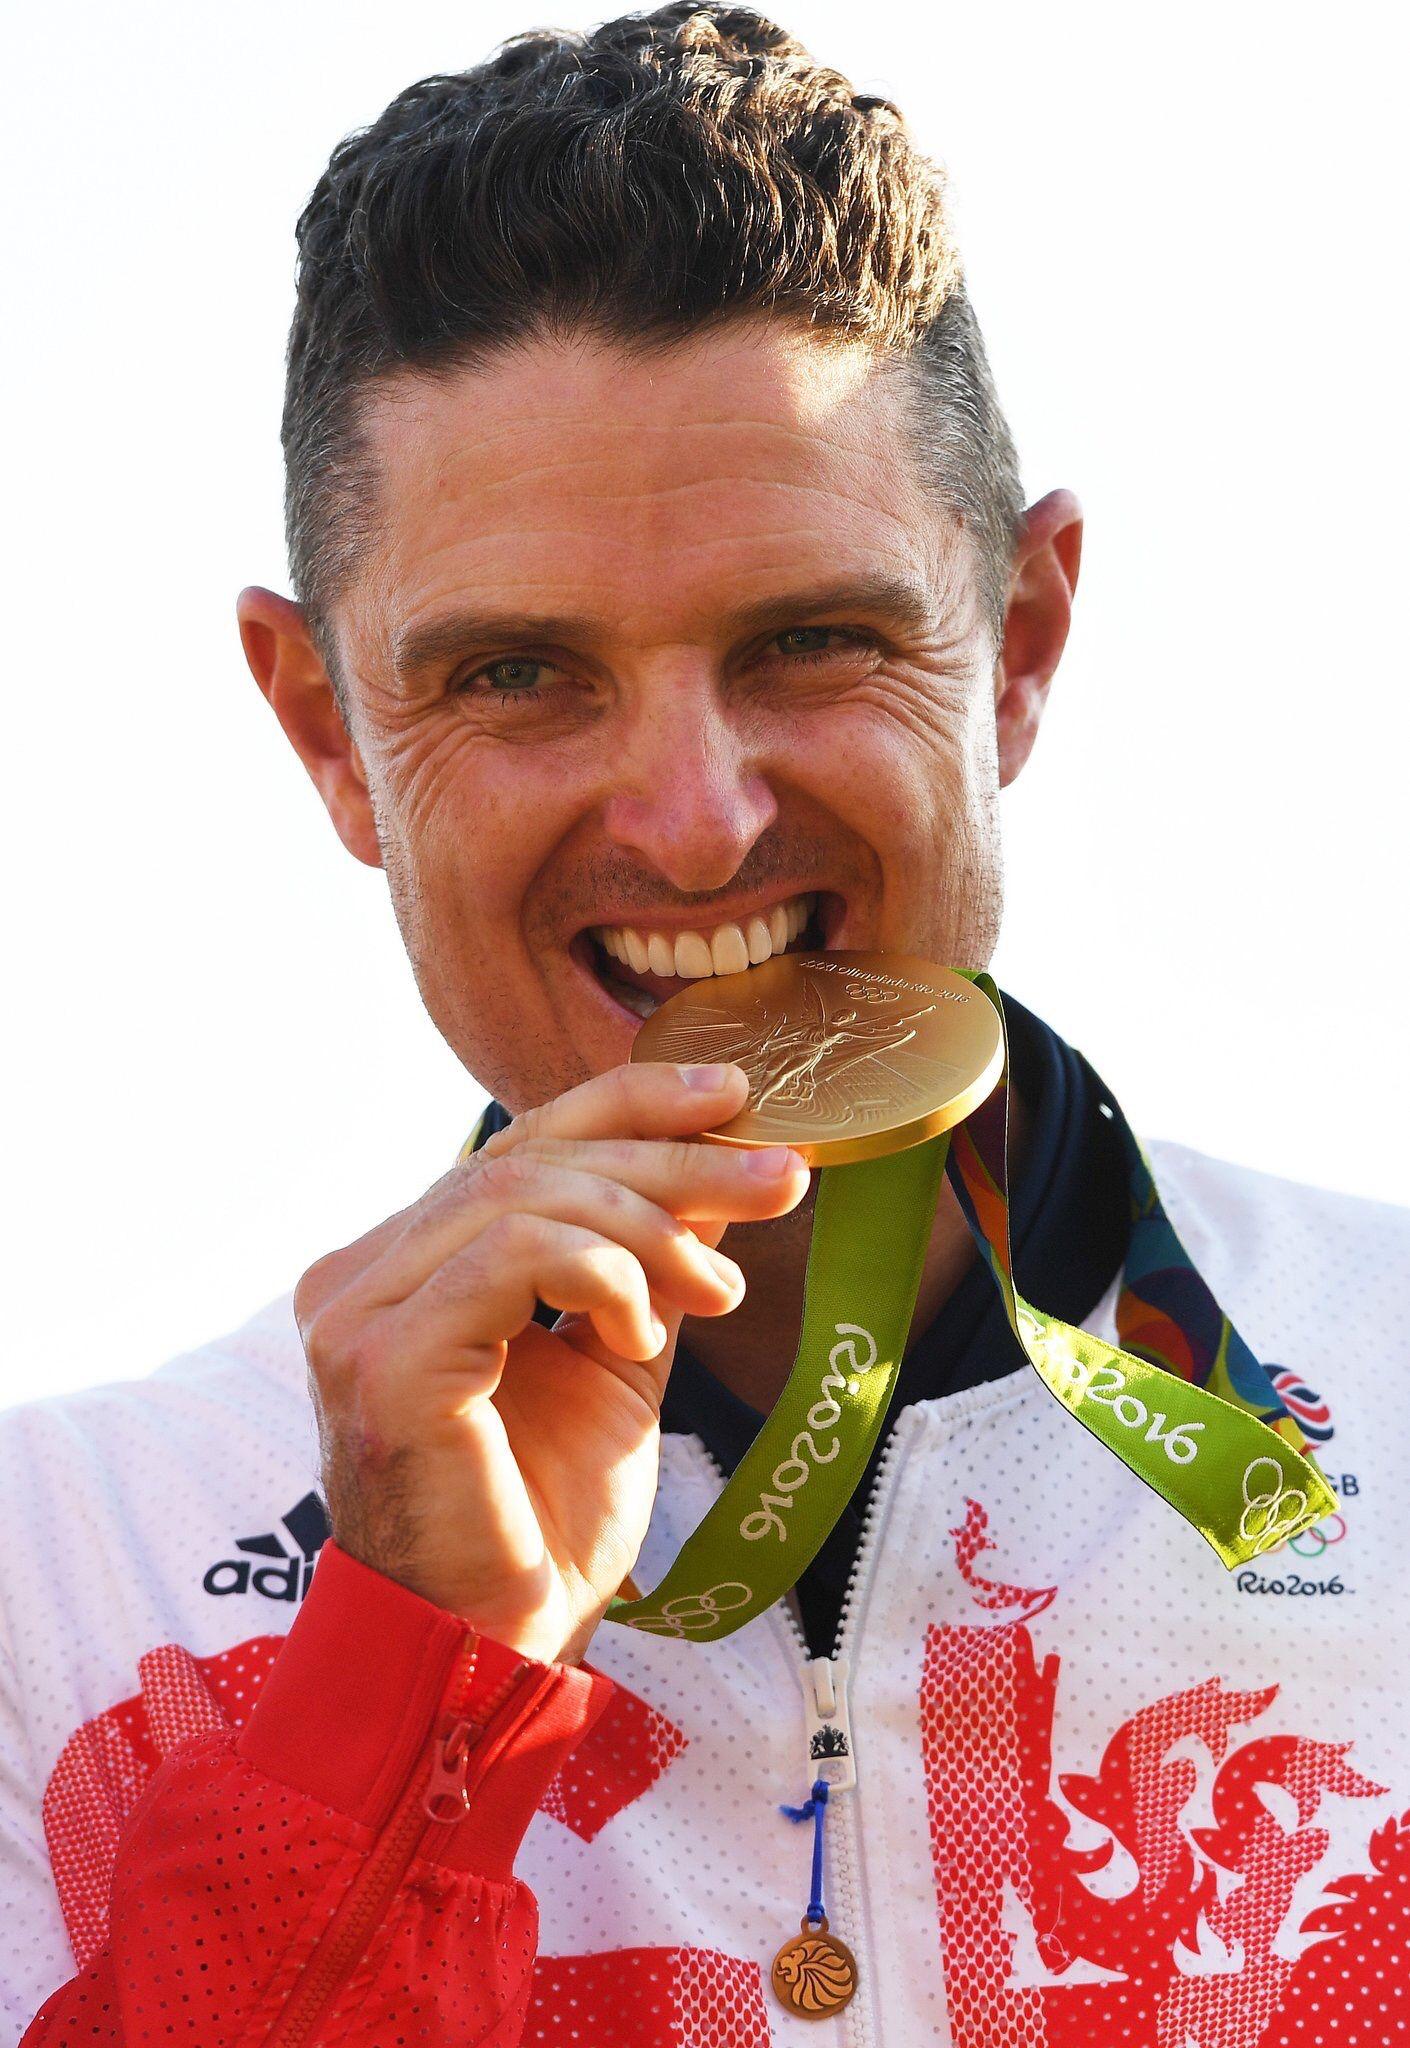 Justin Rose - Rio 2016 Olympics Gold Medalist | Golfing ...